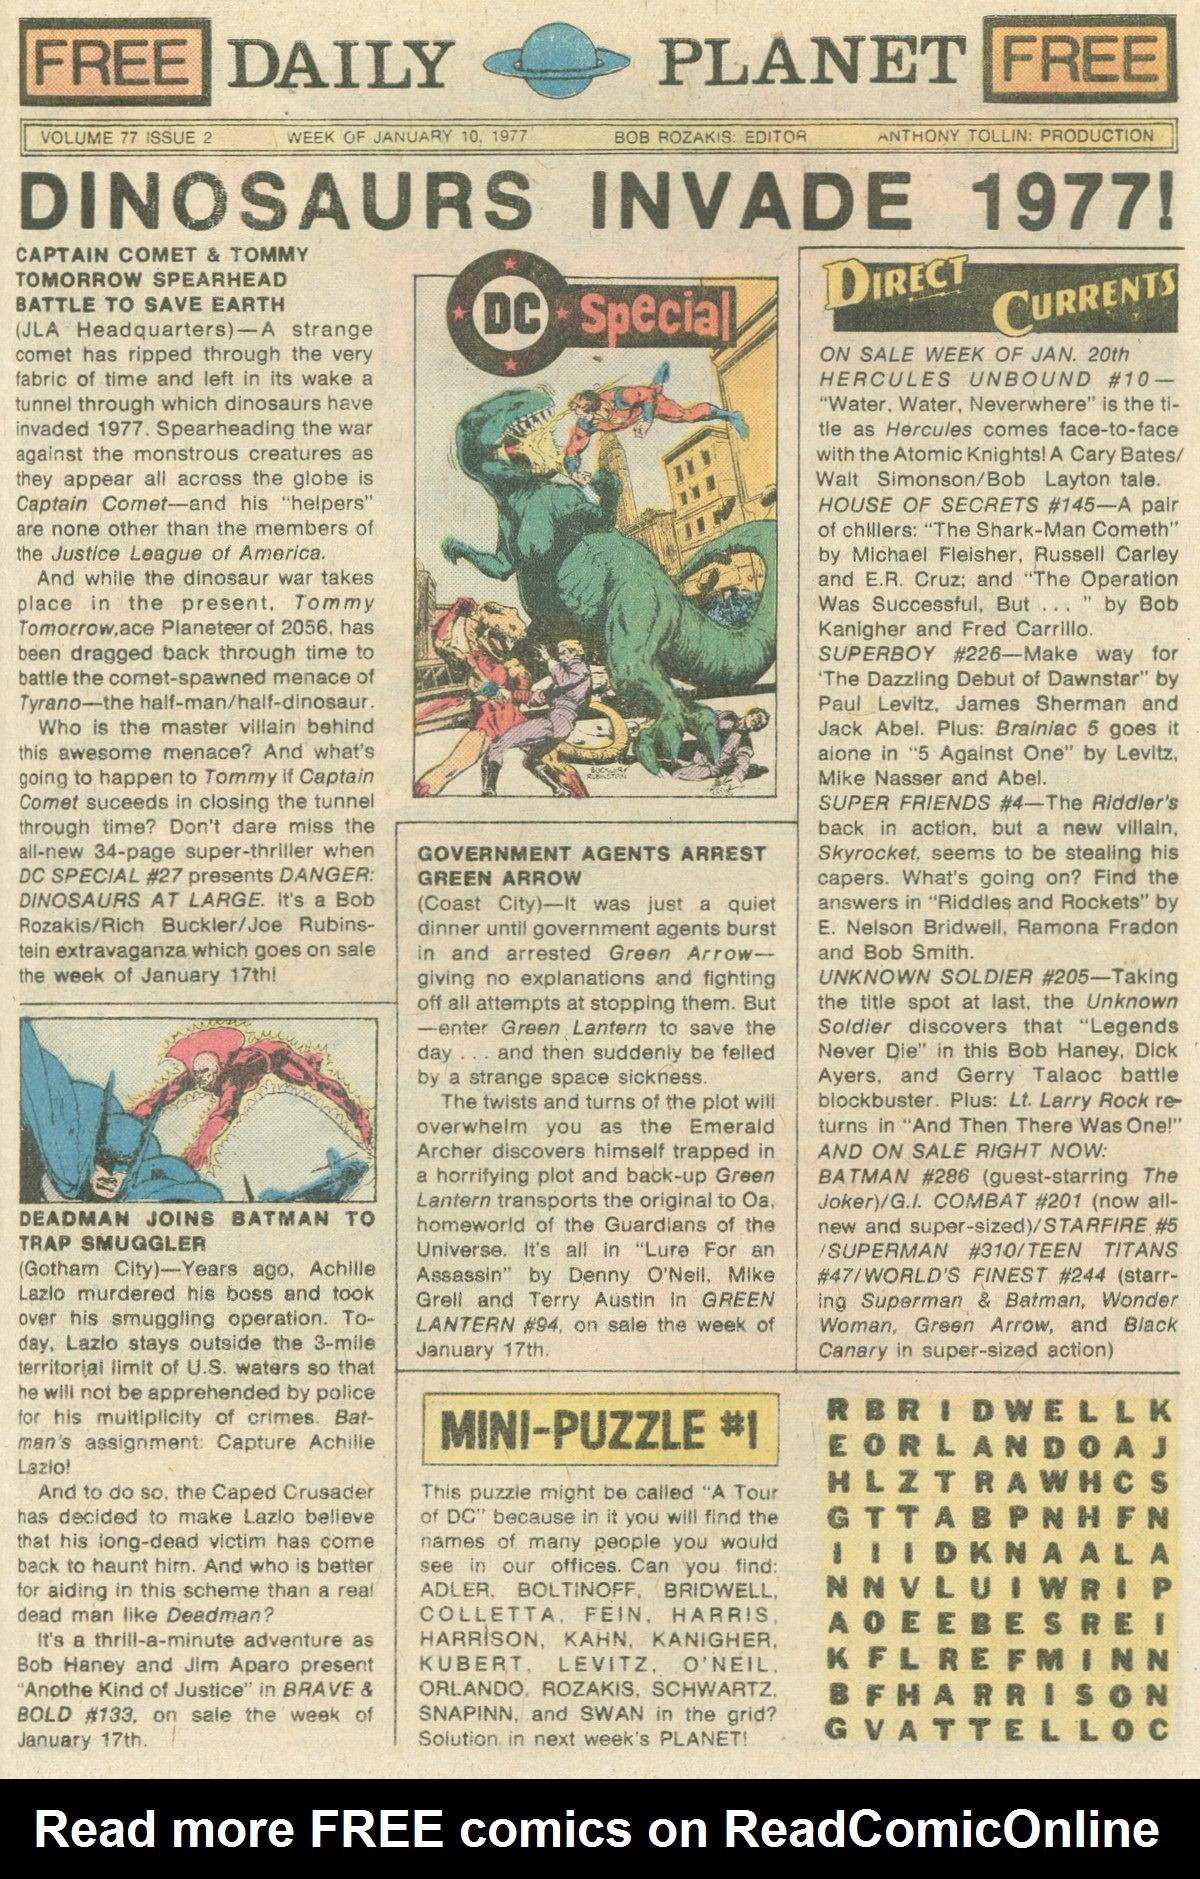 Read online World's Finest Comics comic -  Issue #244 - 81